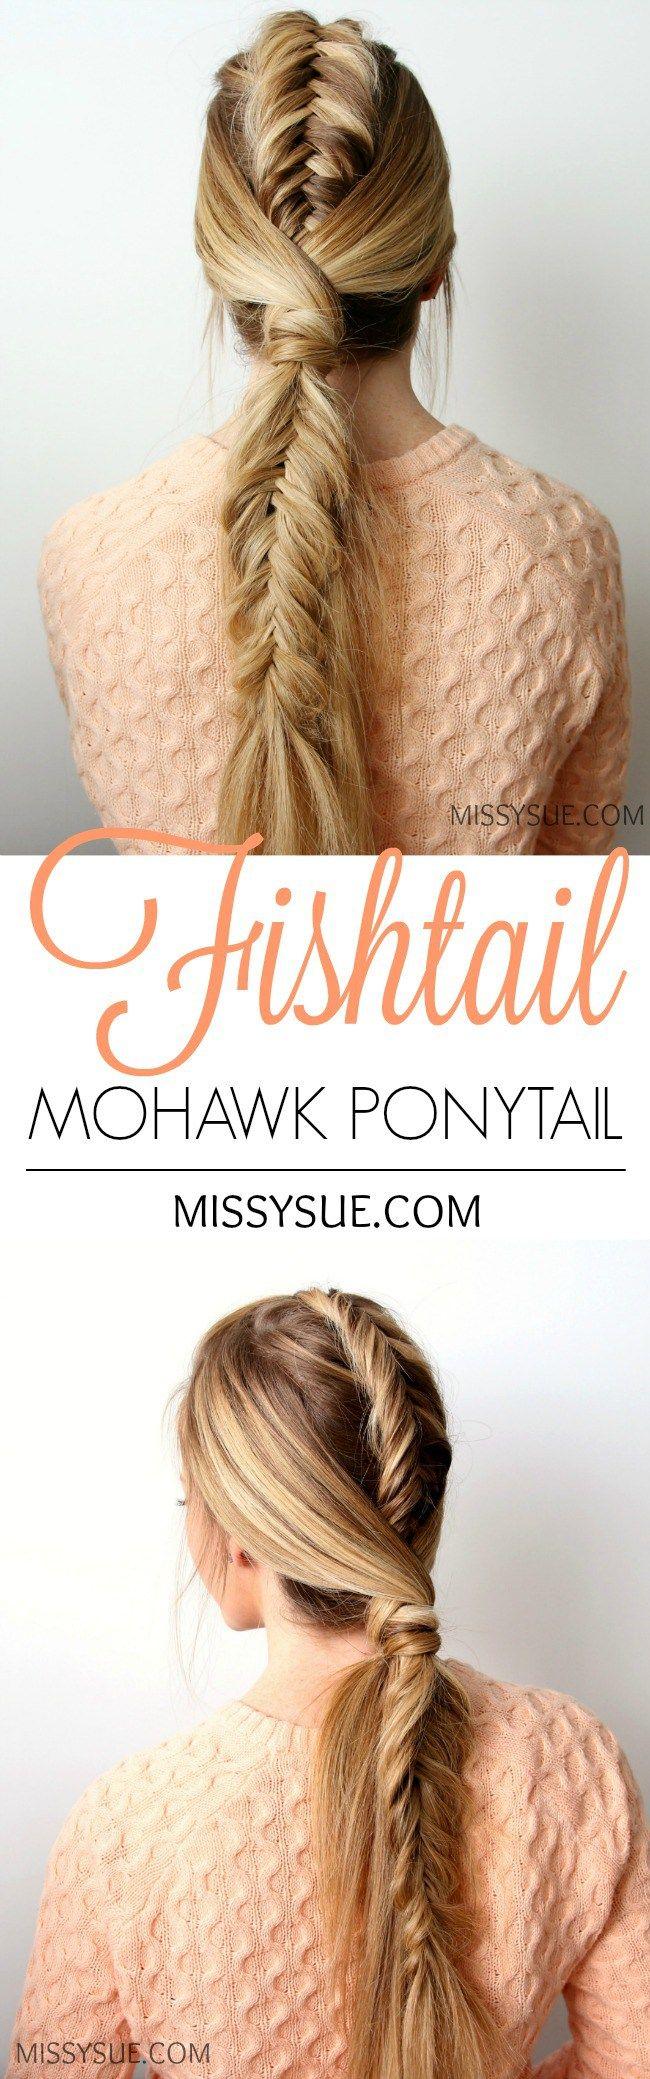 Fishtail Mohawk Ponytail